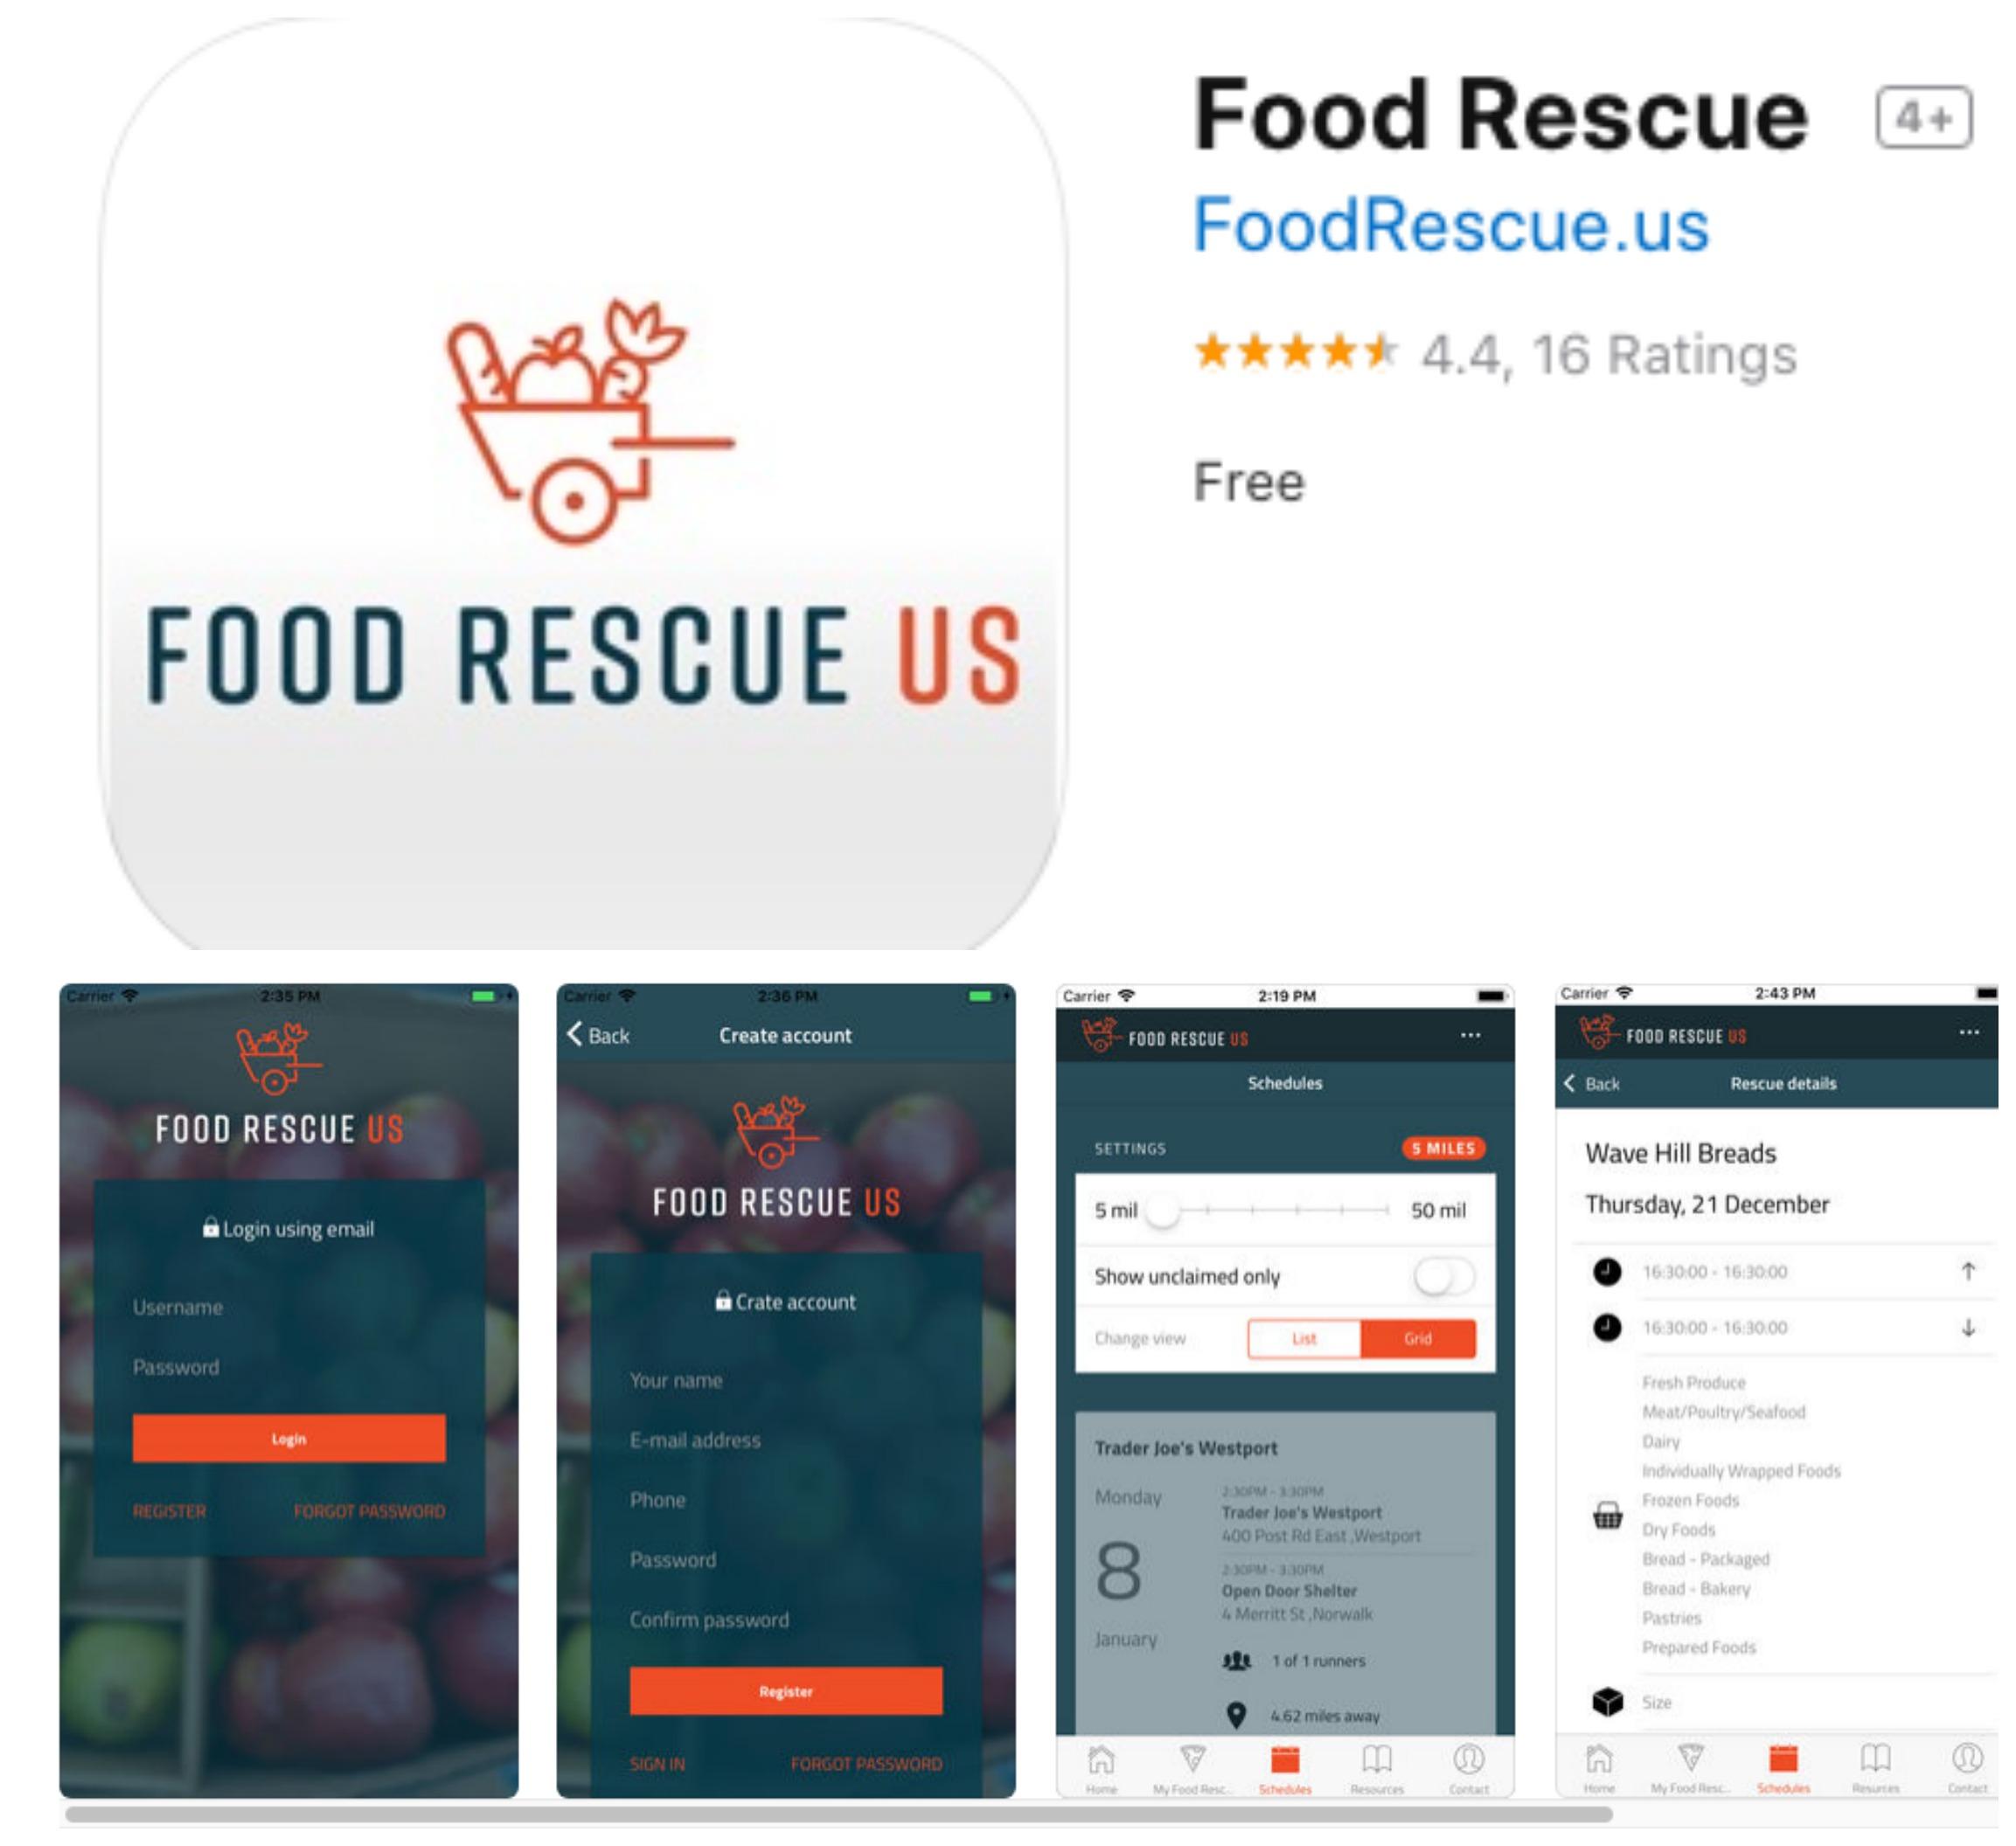 Food Rescue US app